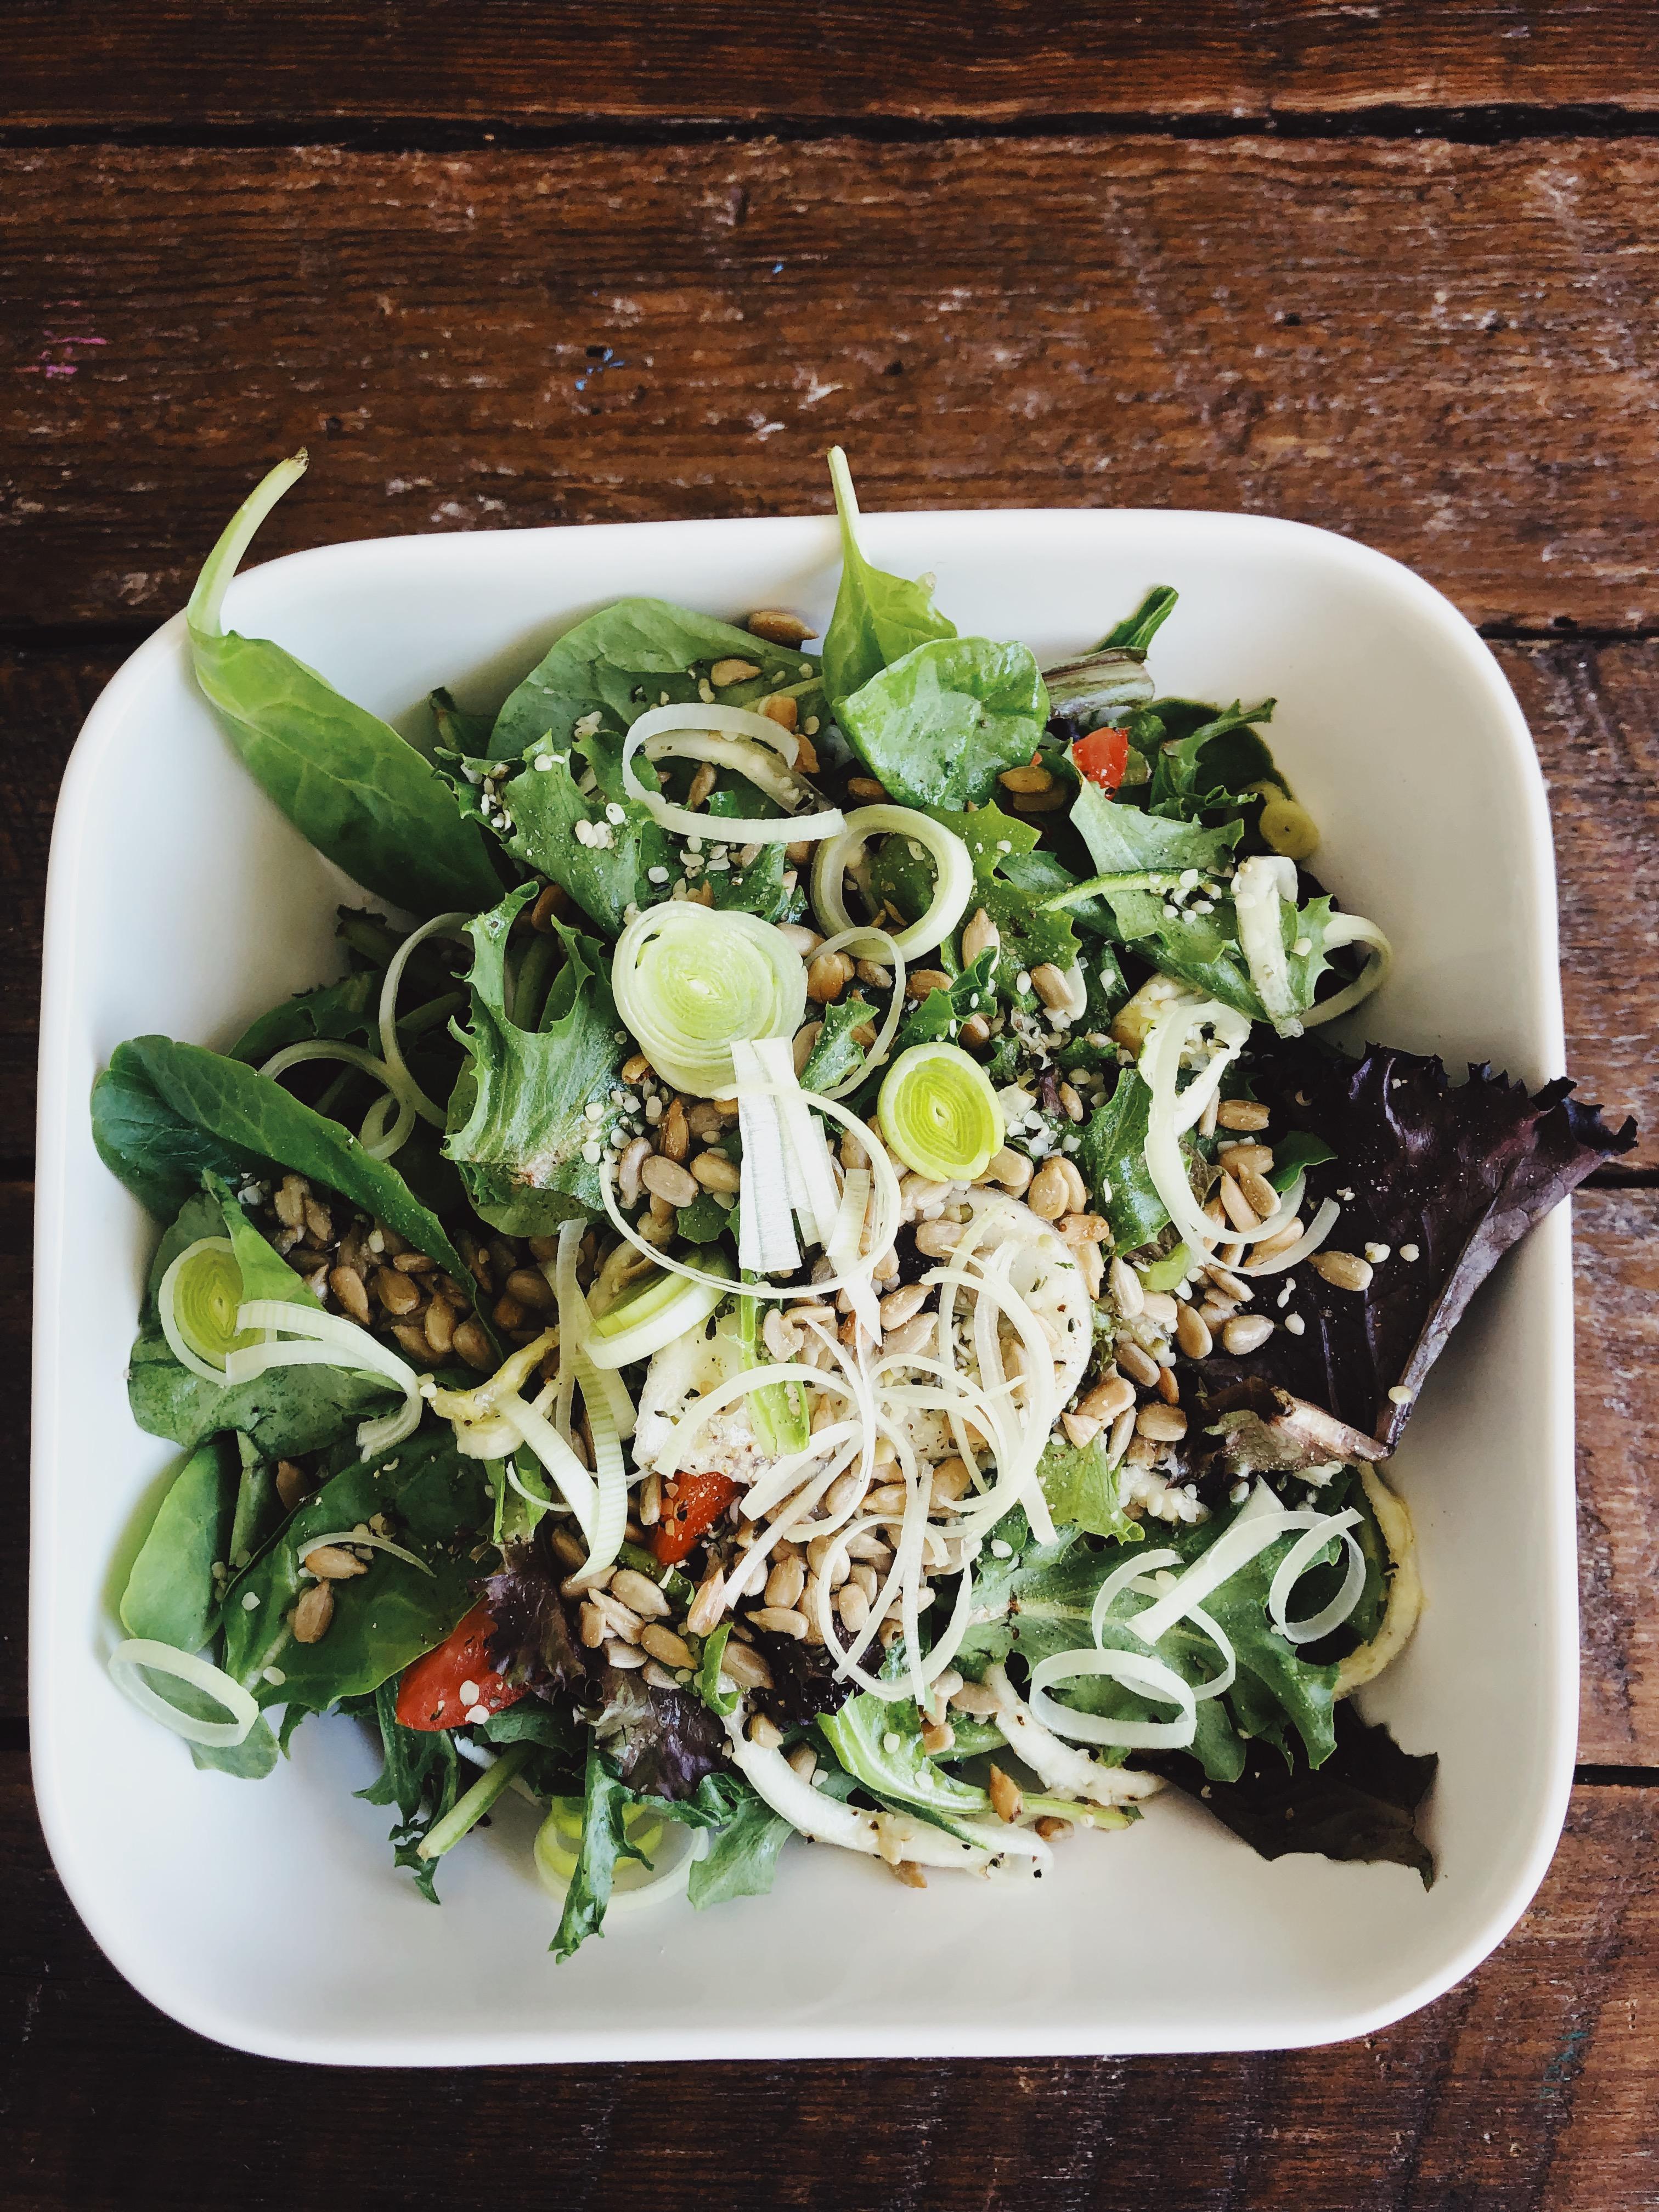 Garden fresh salad for healthy eating with holistic health coach Brooke Freeman